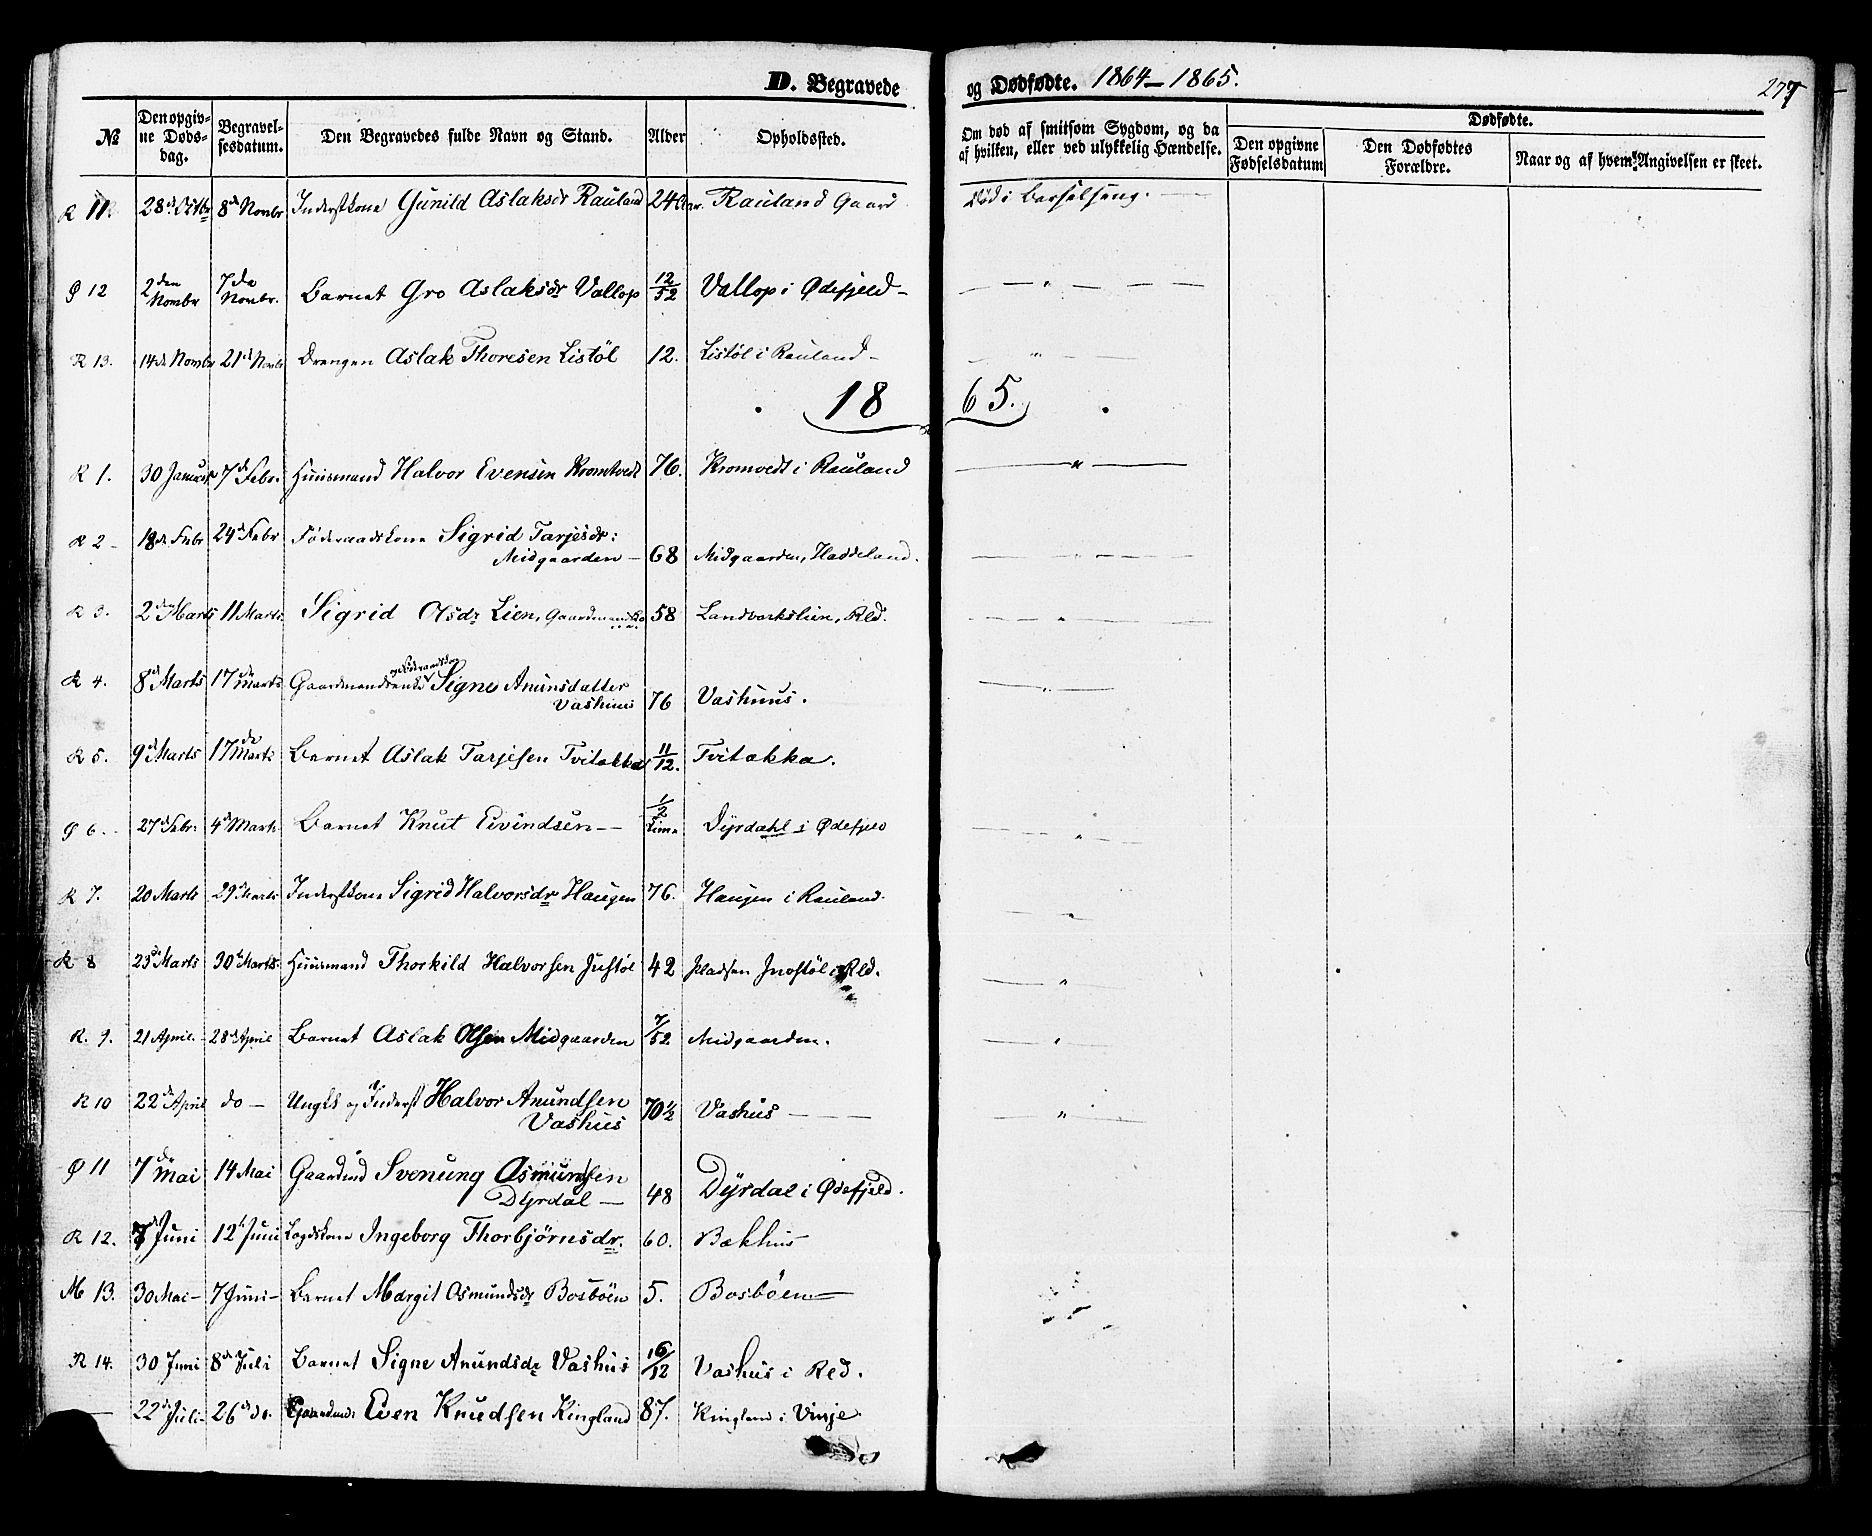 SAKO, Rauland kirkebøker, F/Fa/L0003: Ministerialbok nr. 3, 1859-1886, s. 277